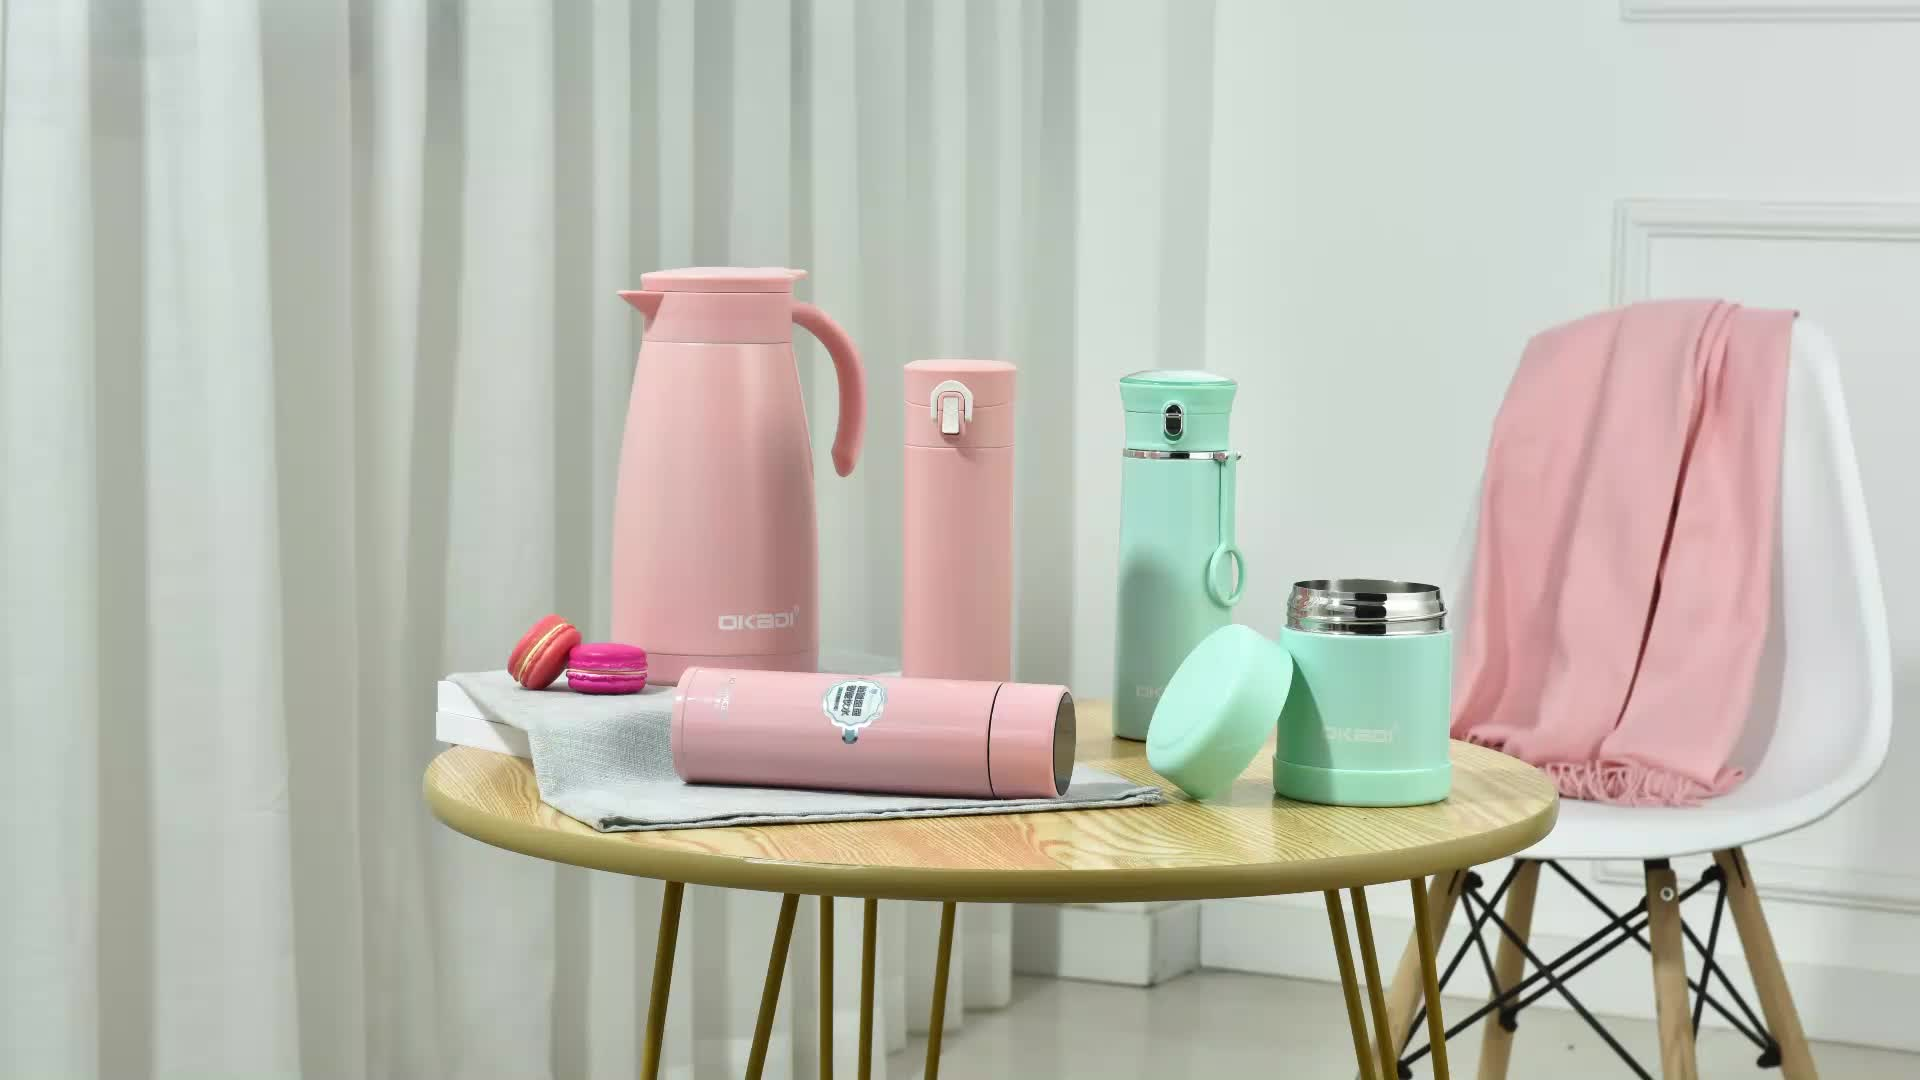 Okadi 新デザインホット販売ステンレススティール魔法瓶食品ジャースプーン